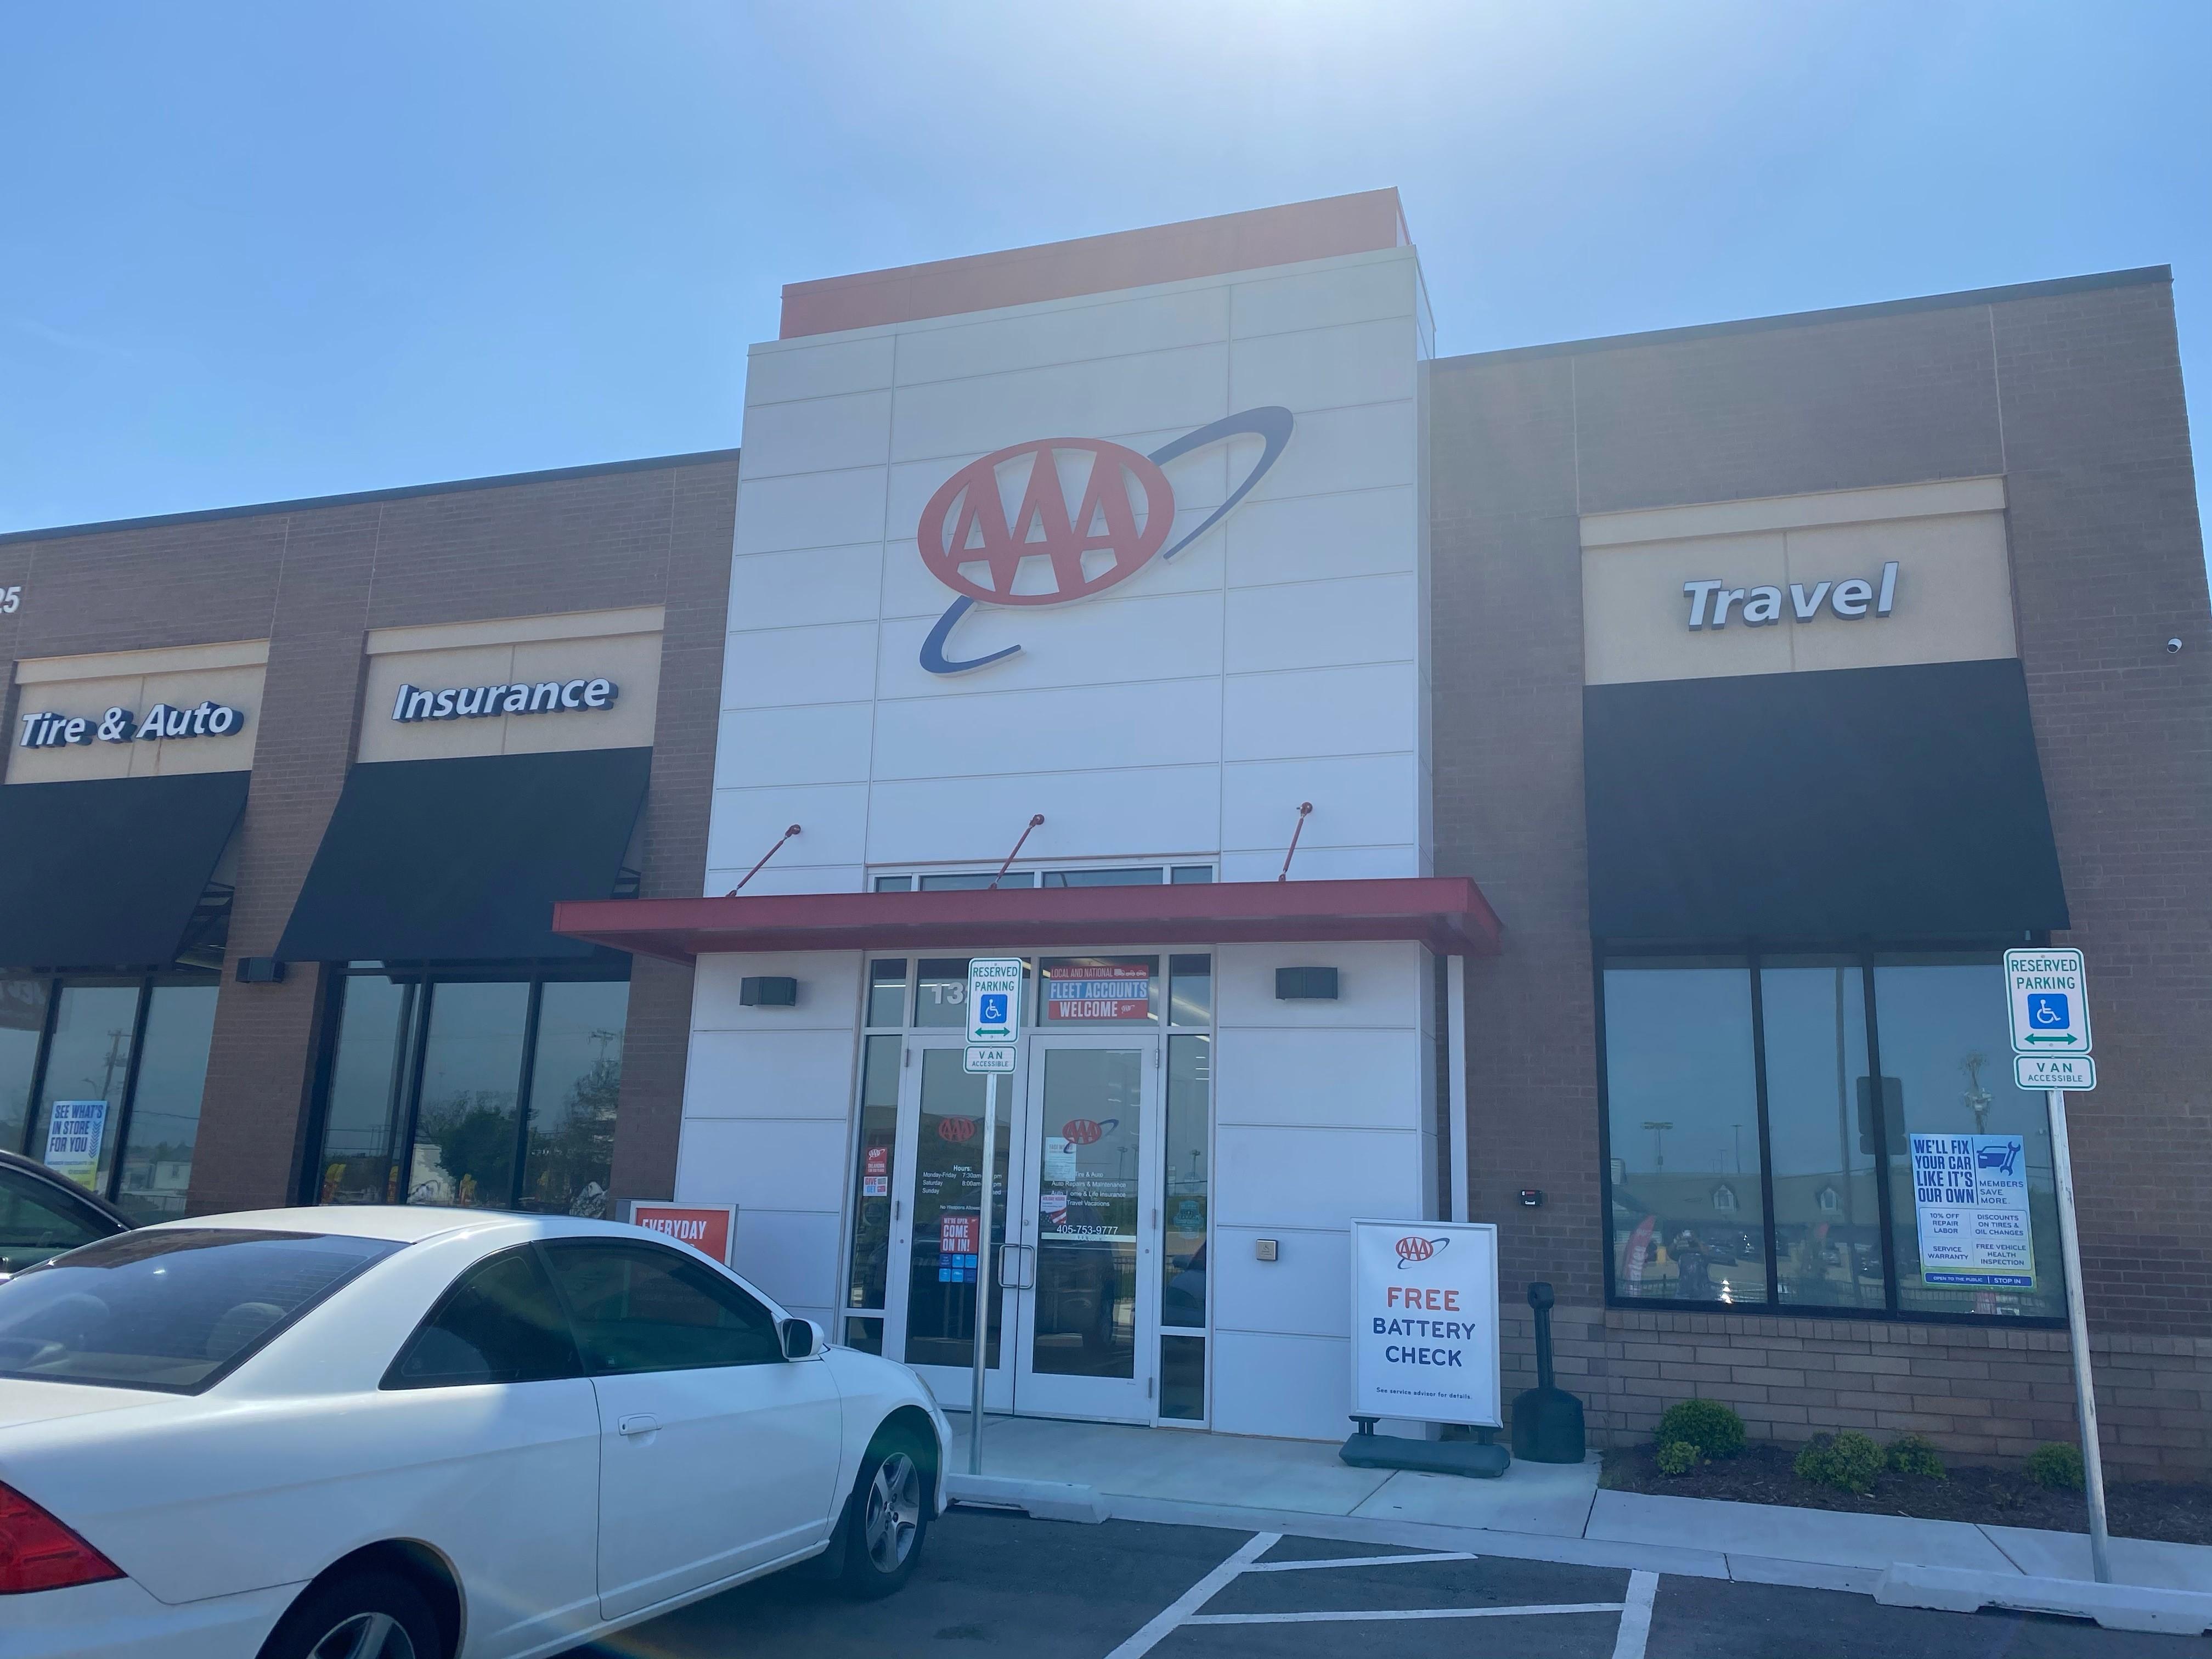 AAA OKC – Quail Springs Tire & Auto Insurance Travel Center